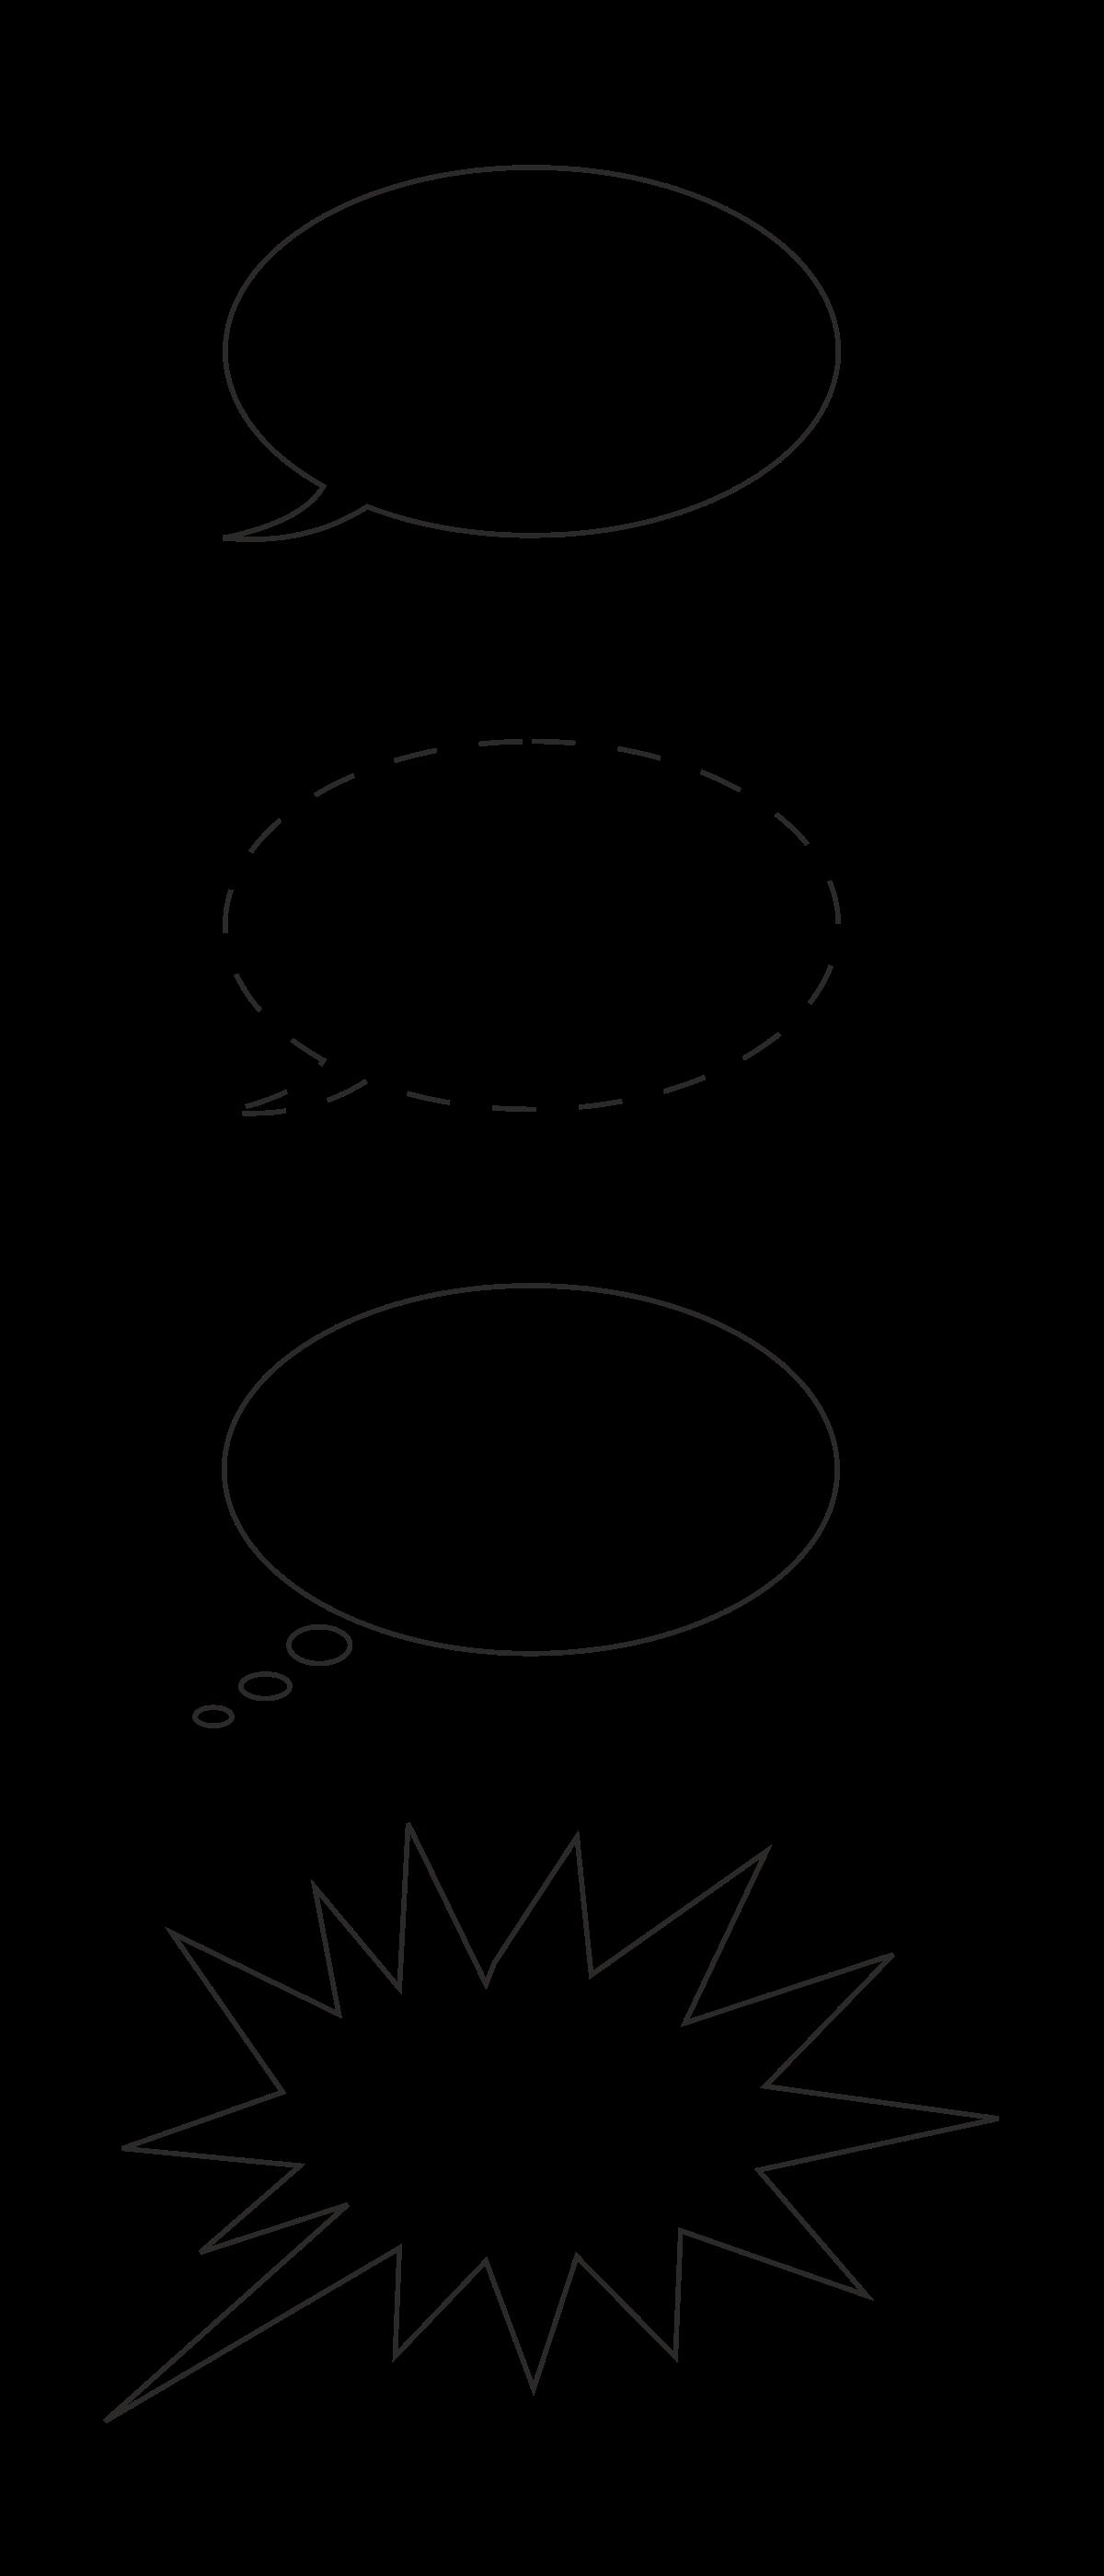 Clipart balloon word. Free photo cartoon balloons